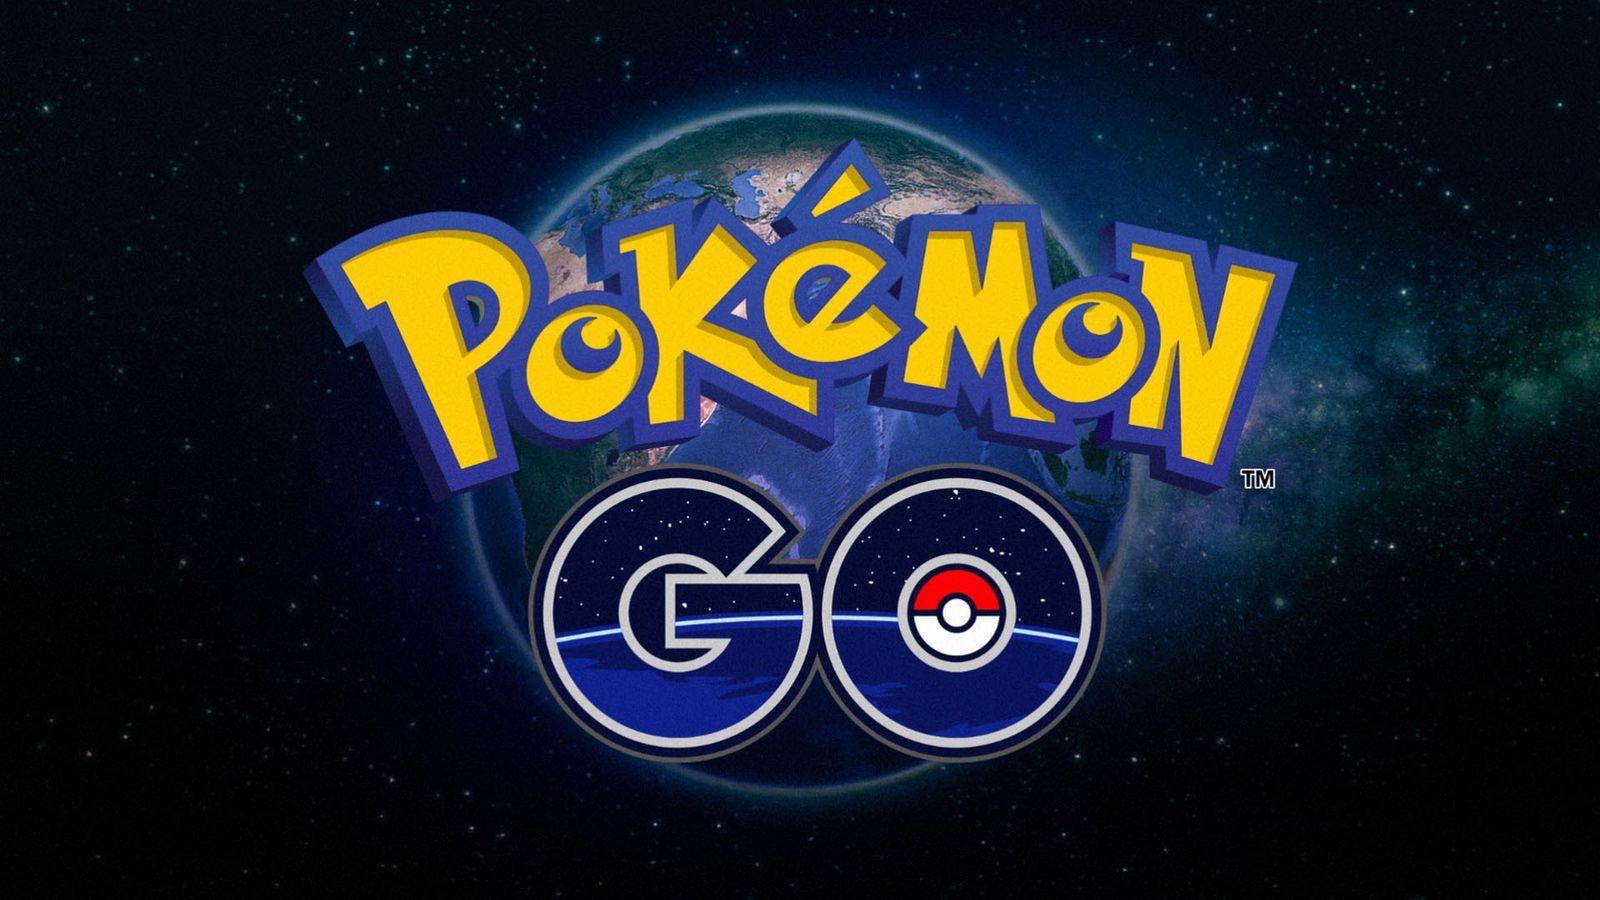 Pokémon GO: Niantic ecco quando arrivano seconda gen e nuove features